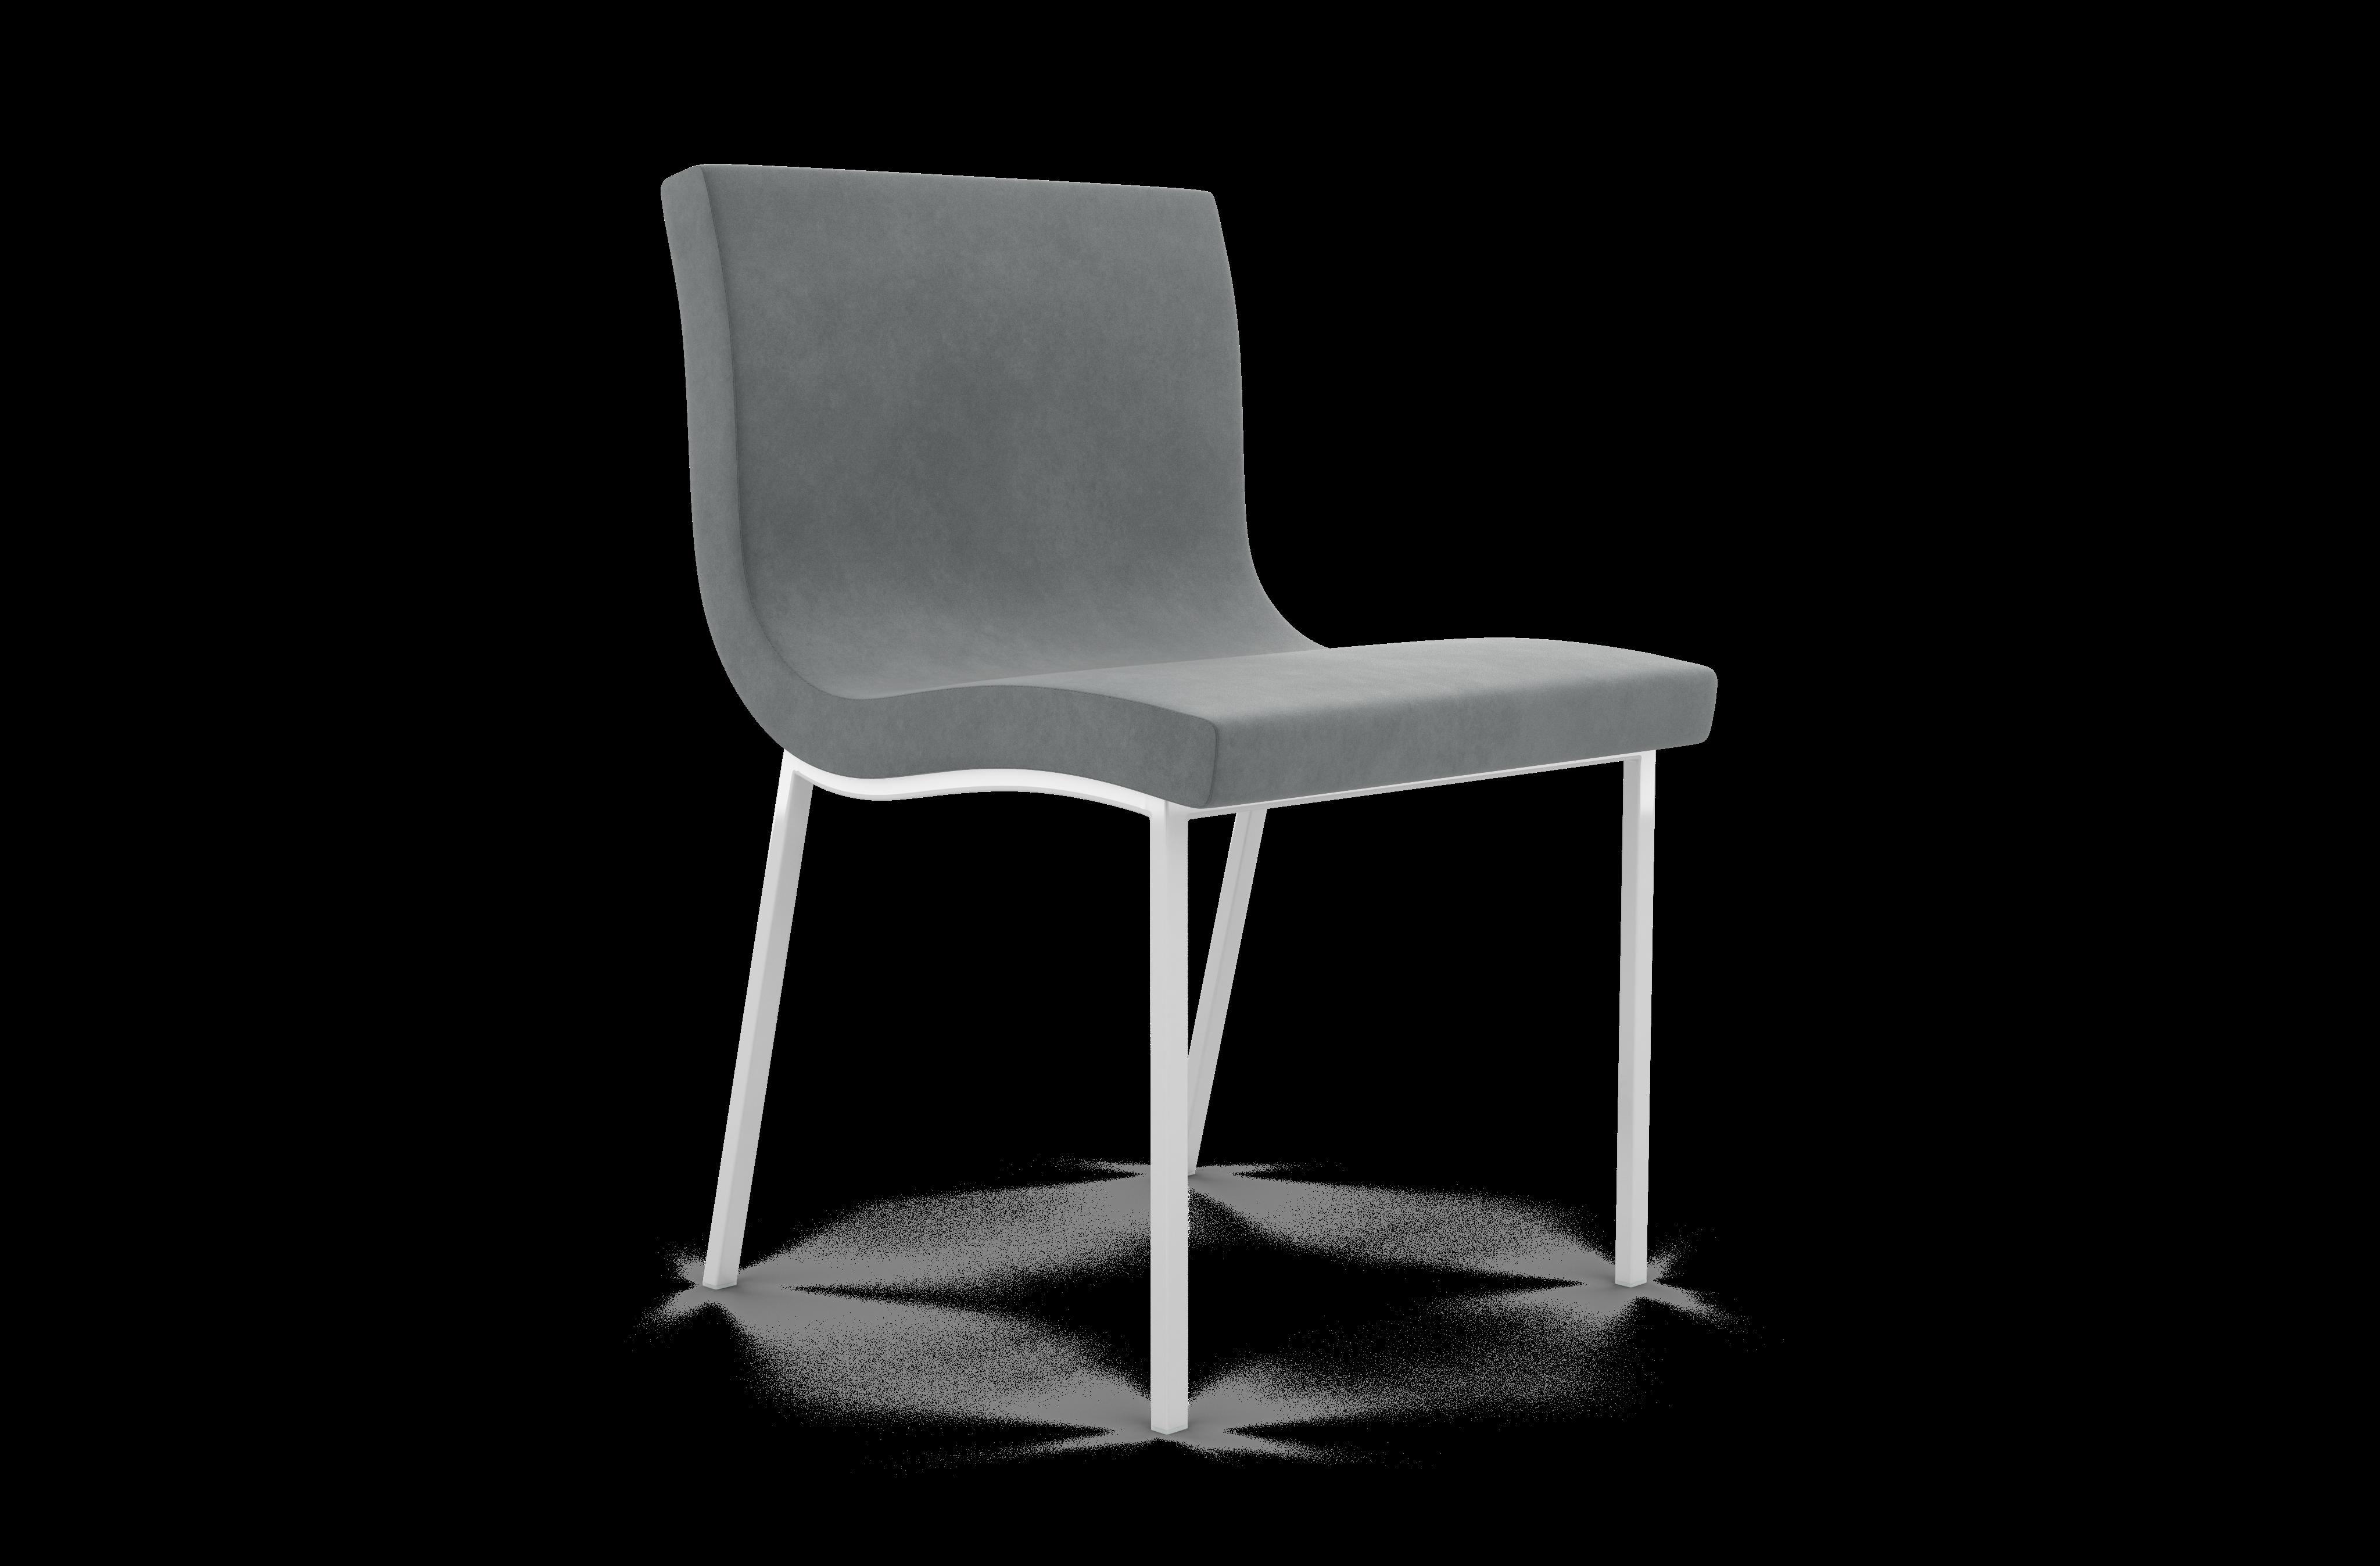 sala chairs from designer pascal mourgue ligne roset. Black Bedroom Furniture Sets. Home Design Ideas